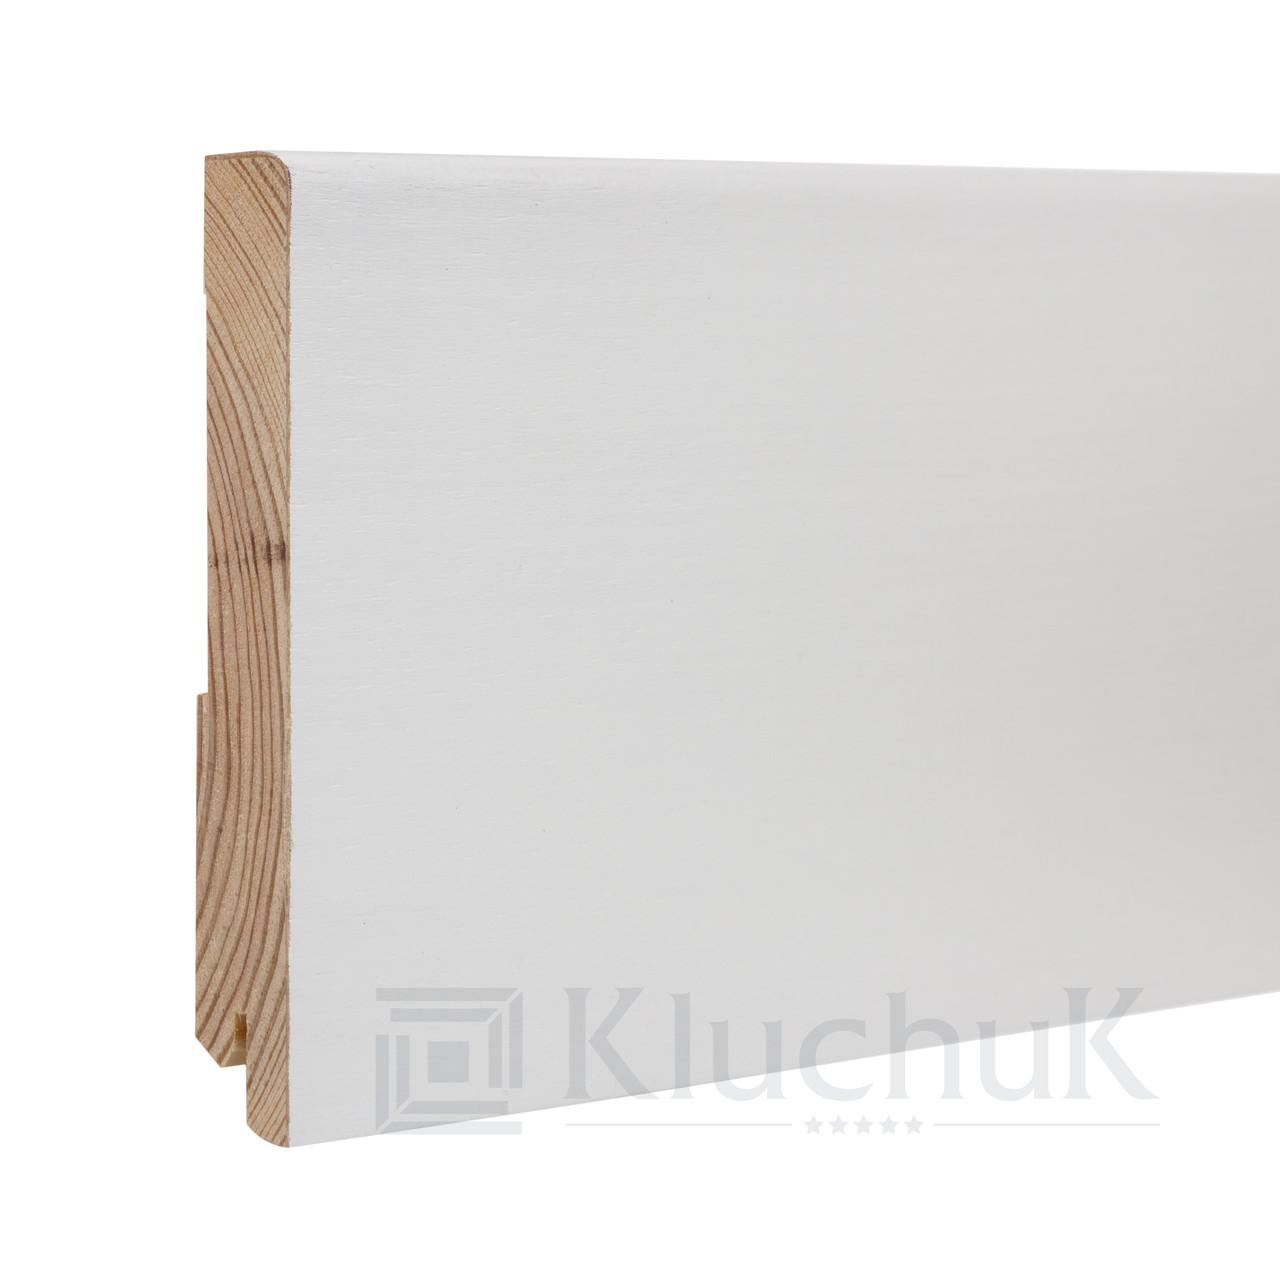 Плинтус Kluchuk White Plinth KLW-07 Модерн 120мм